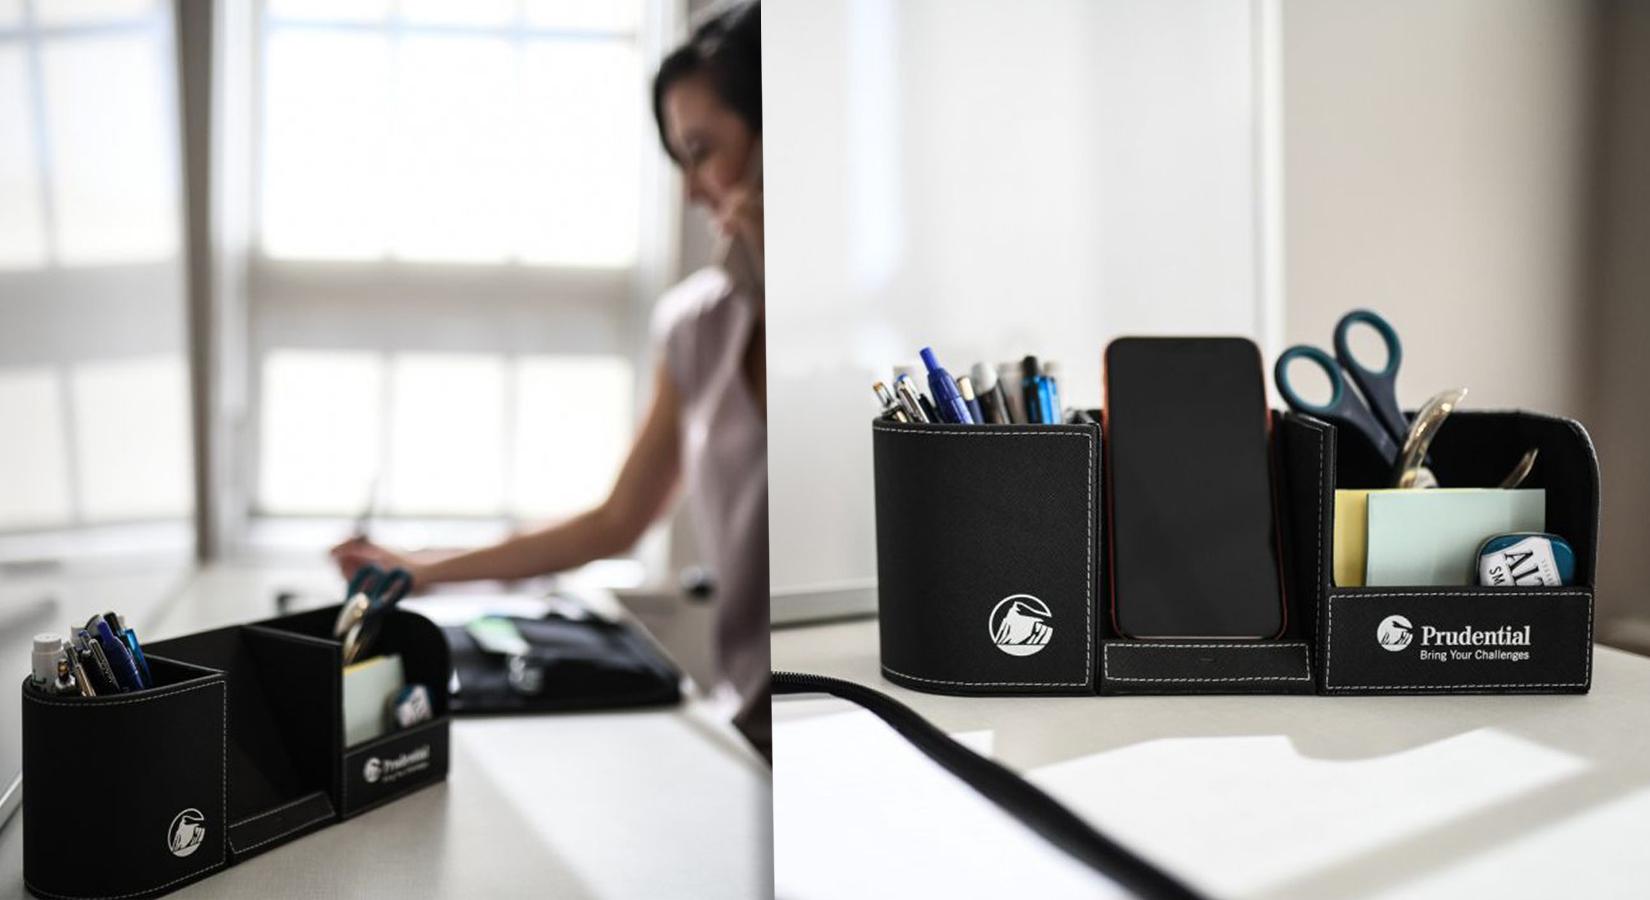 *New Product Alert* – Wireless Charging Desk Organizer